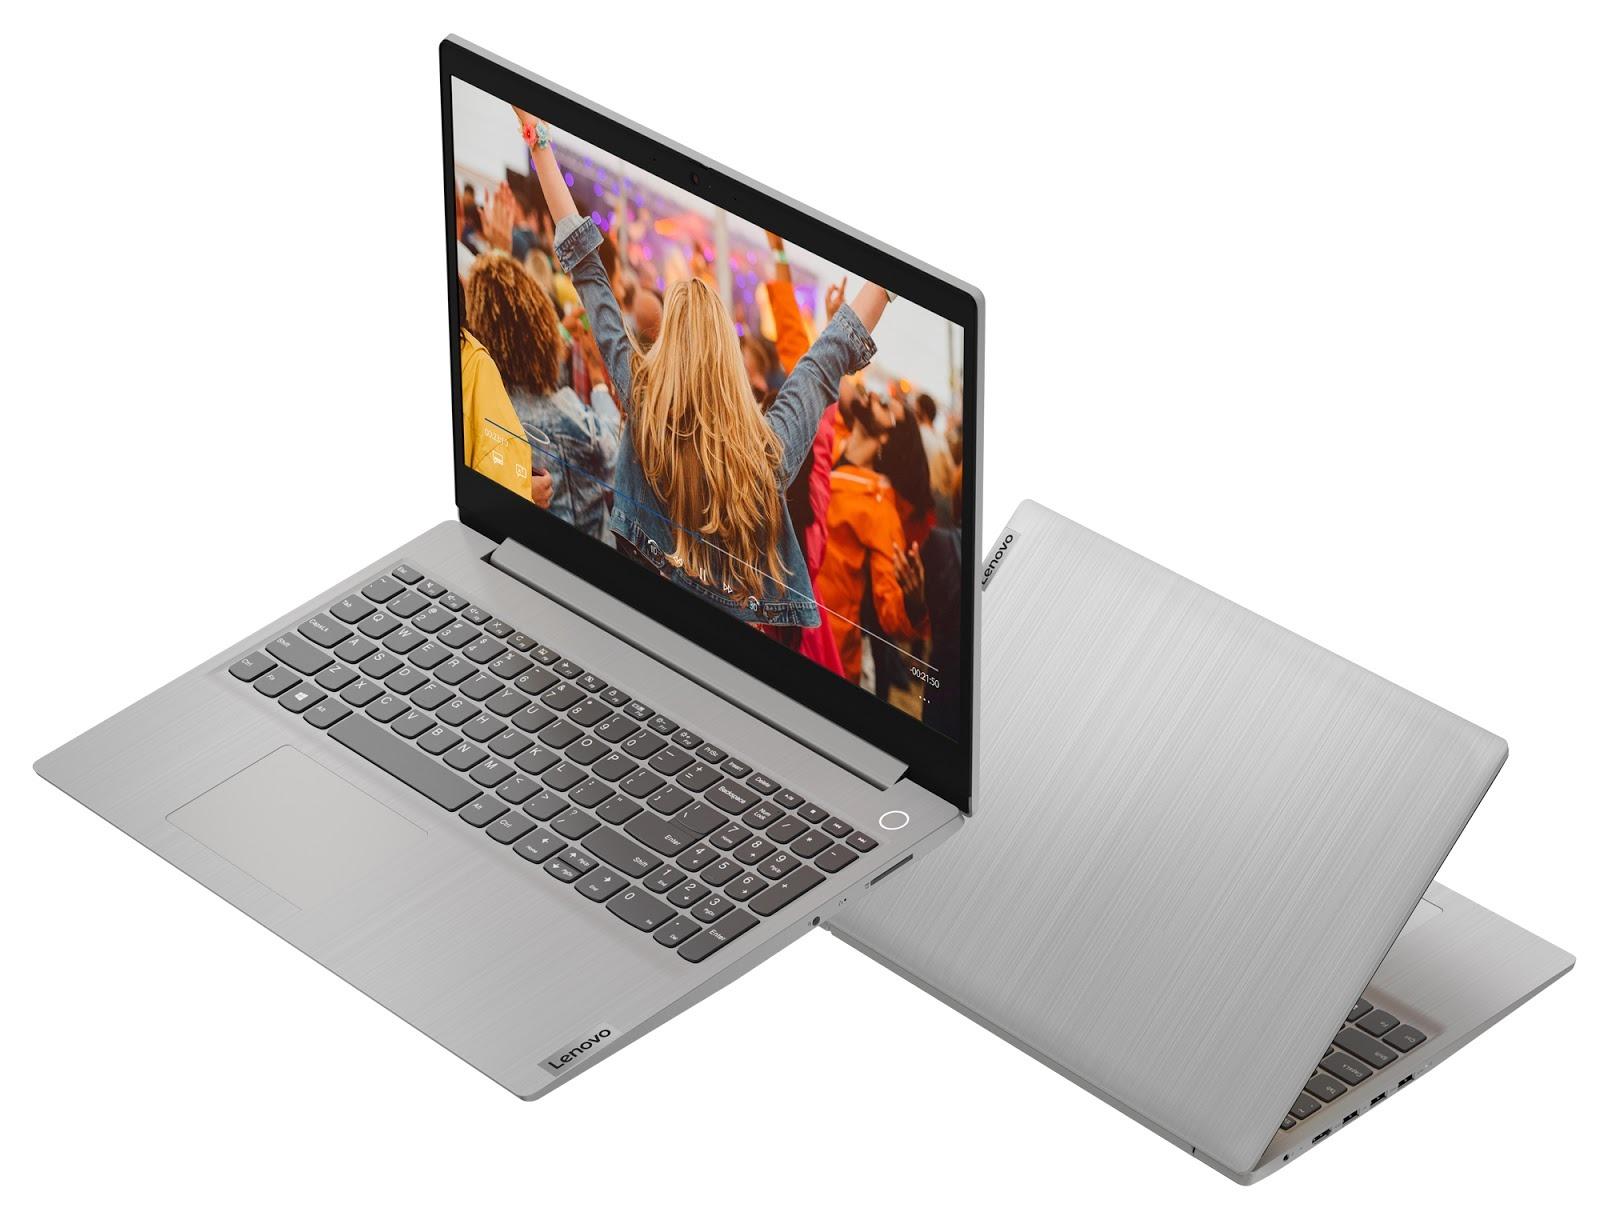 Фото 3. Ноутбук Lenovo ideapad 3 15ADA05 (81W100GWRE)